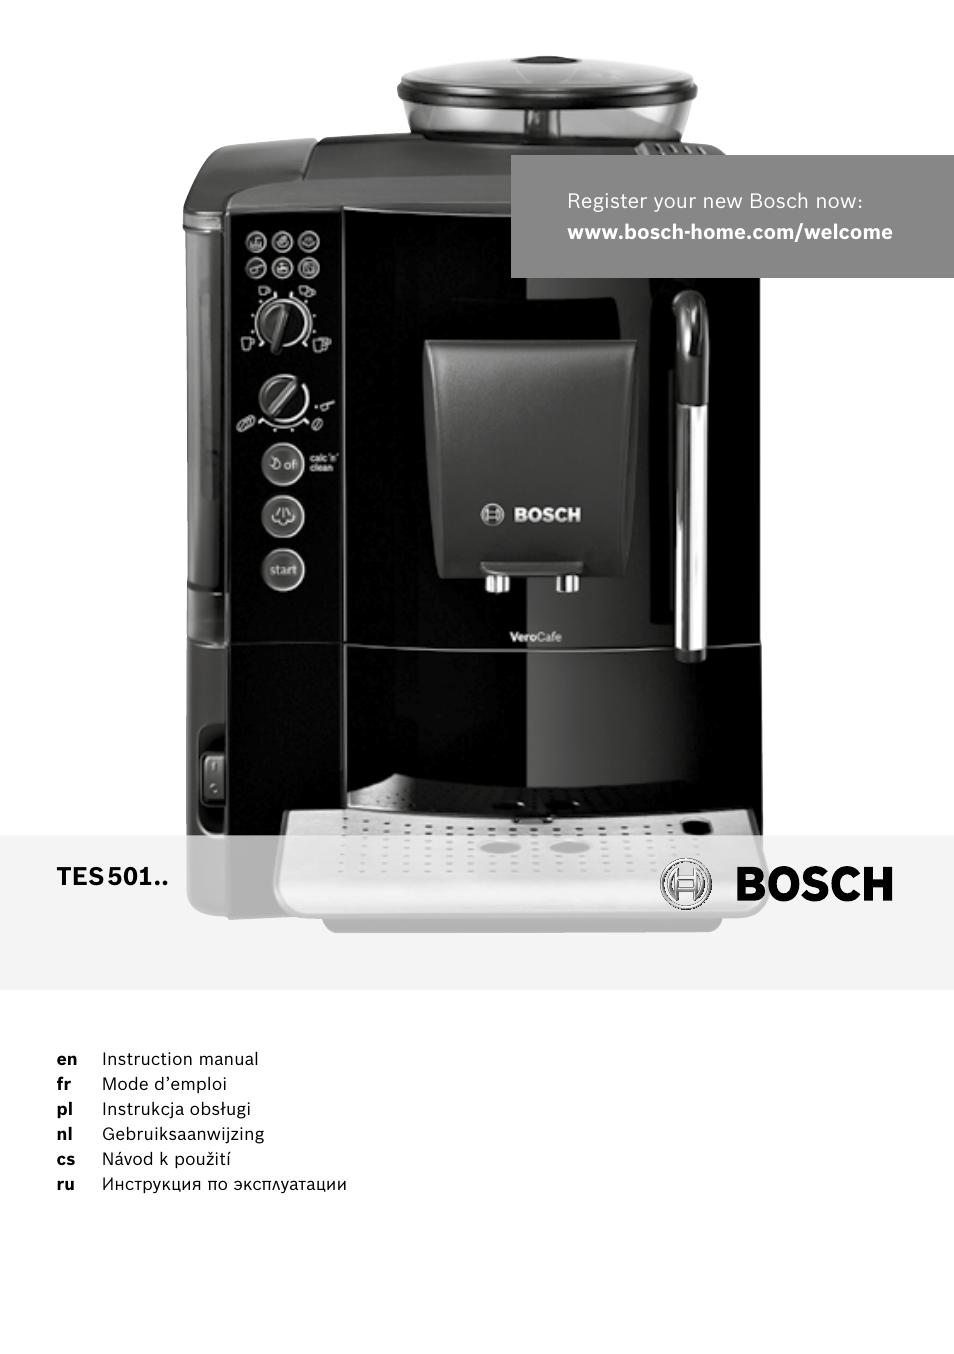 bosch tes50129rw verocafe machine caf expresso automatique noir user manual 122 pages. Black Bedroom Furniture Sets. Home Design Ideas